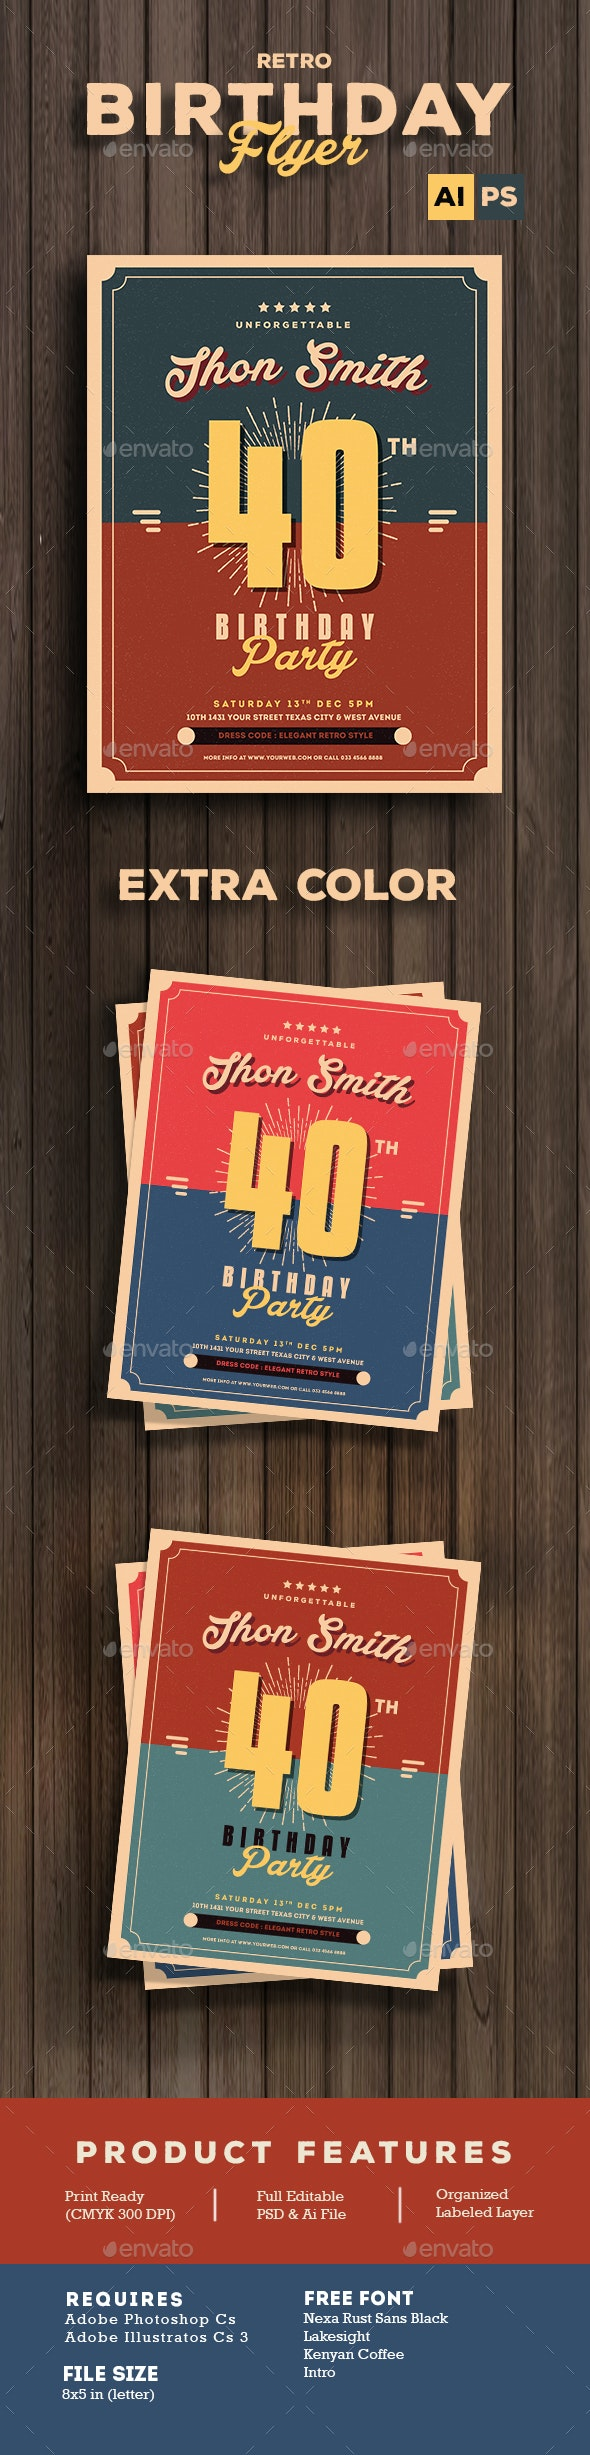 Retro Birthday Party Flyer - Flyers Print Templates